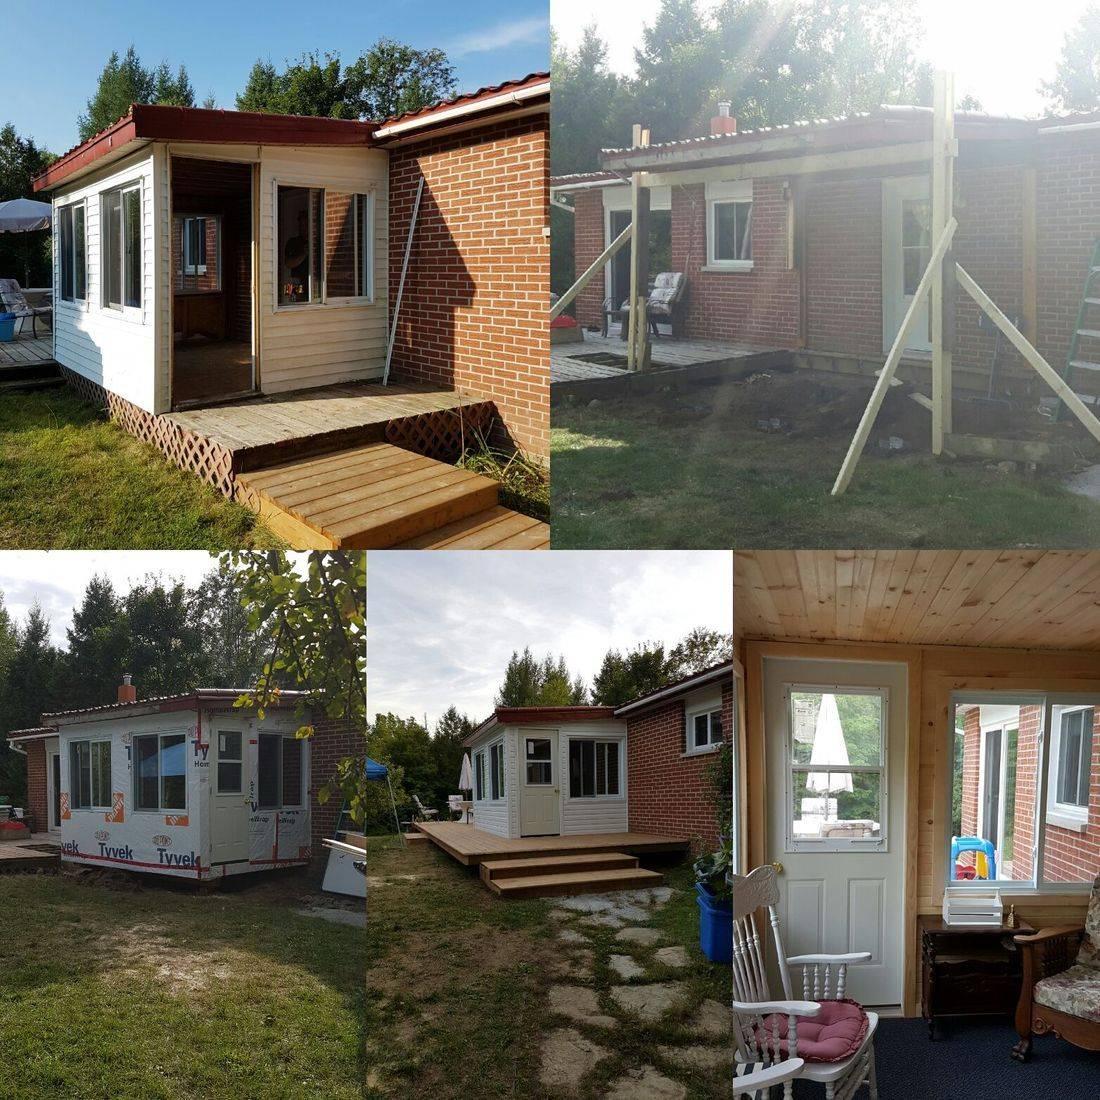 Muskoka, Renovation, Exterior, Sunroom, Deck, Contractor, Carpenter